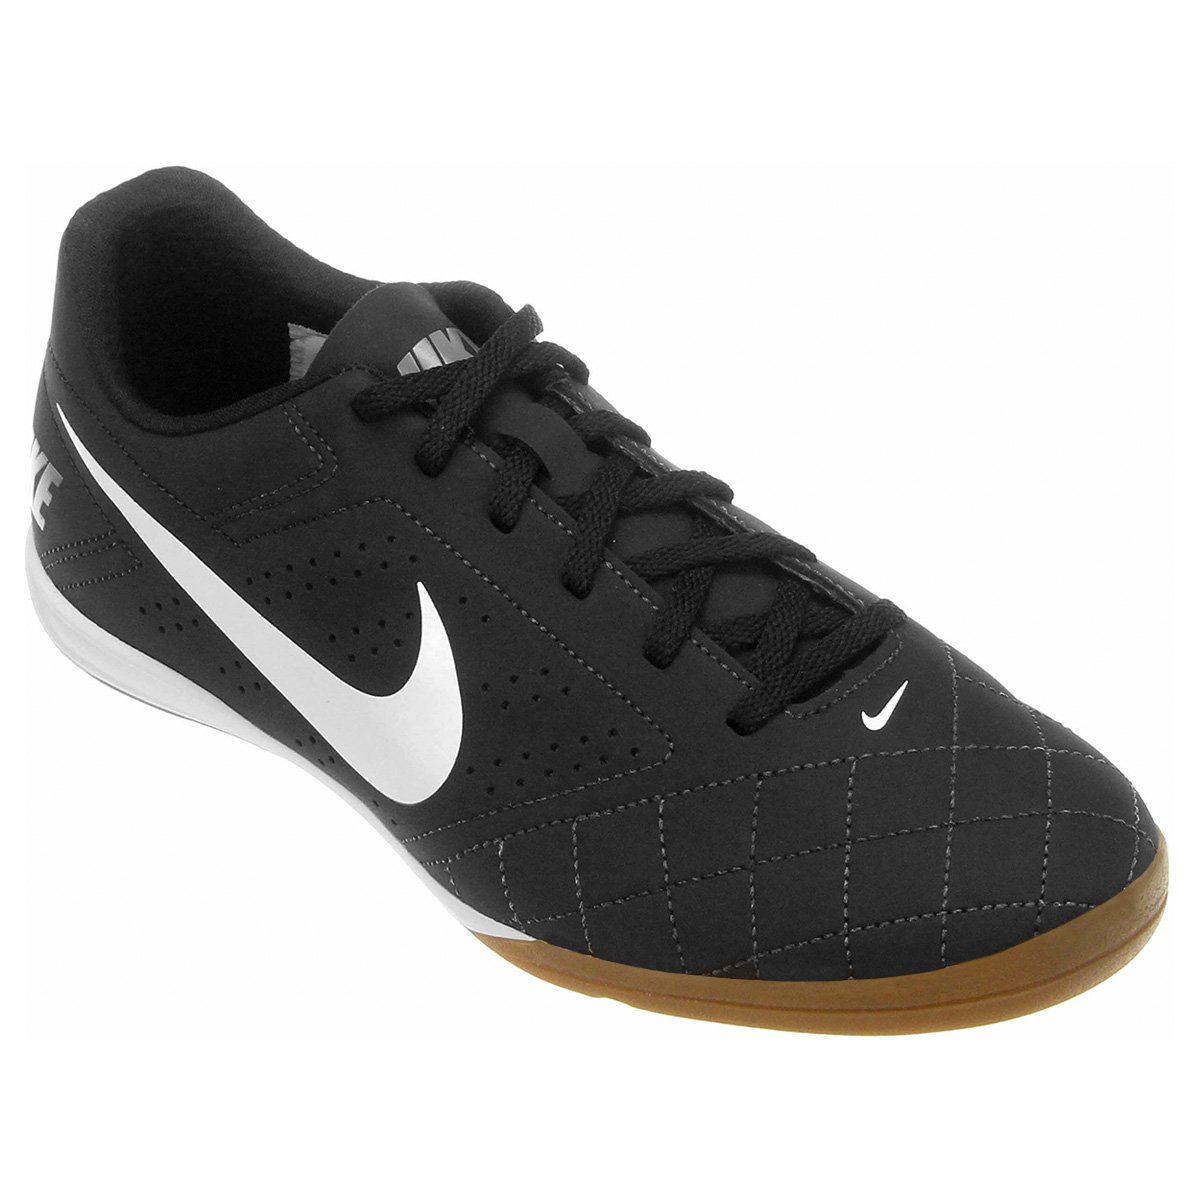 calidad y cantidad asegurada Venta de liquidación 2019 2019 profesional Chuteira Futsal Nike Beco 2 Futsal - Preto e Branco